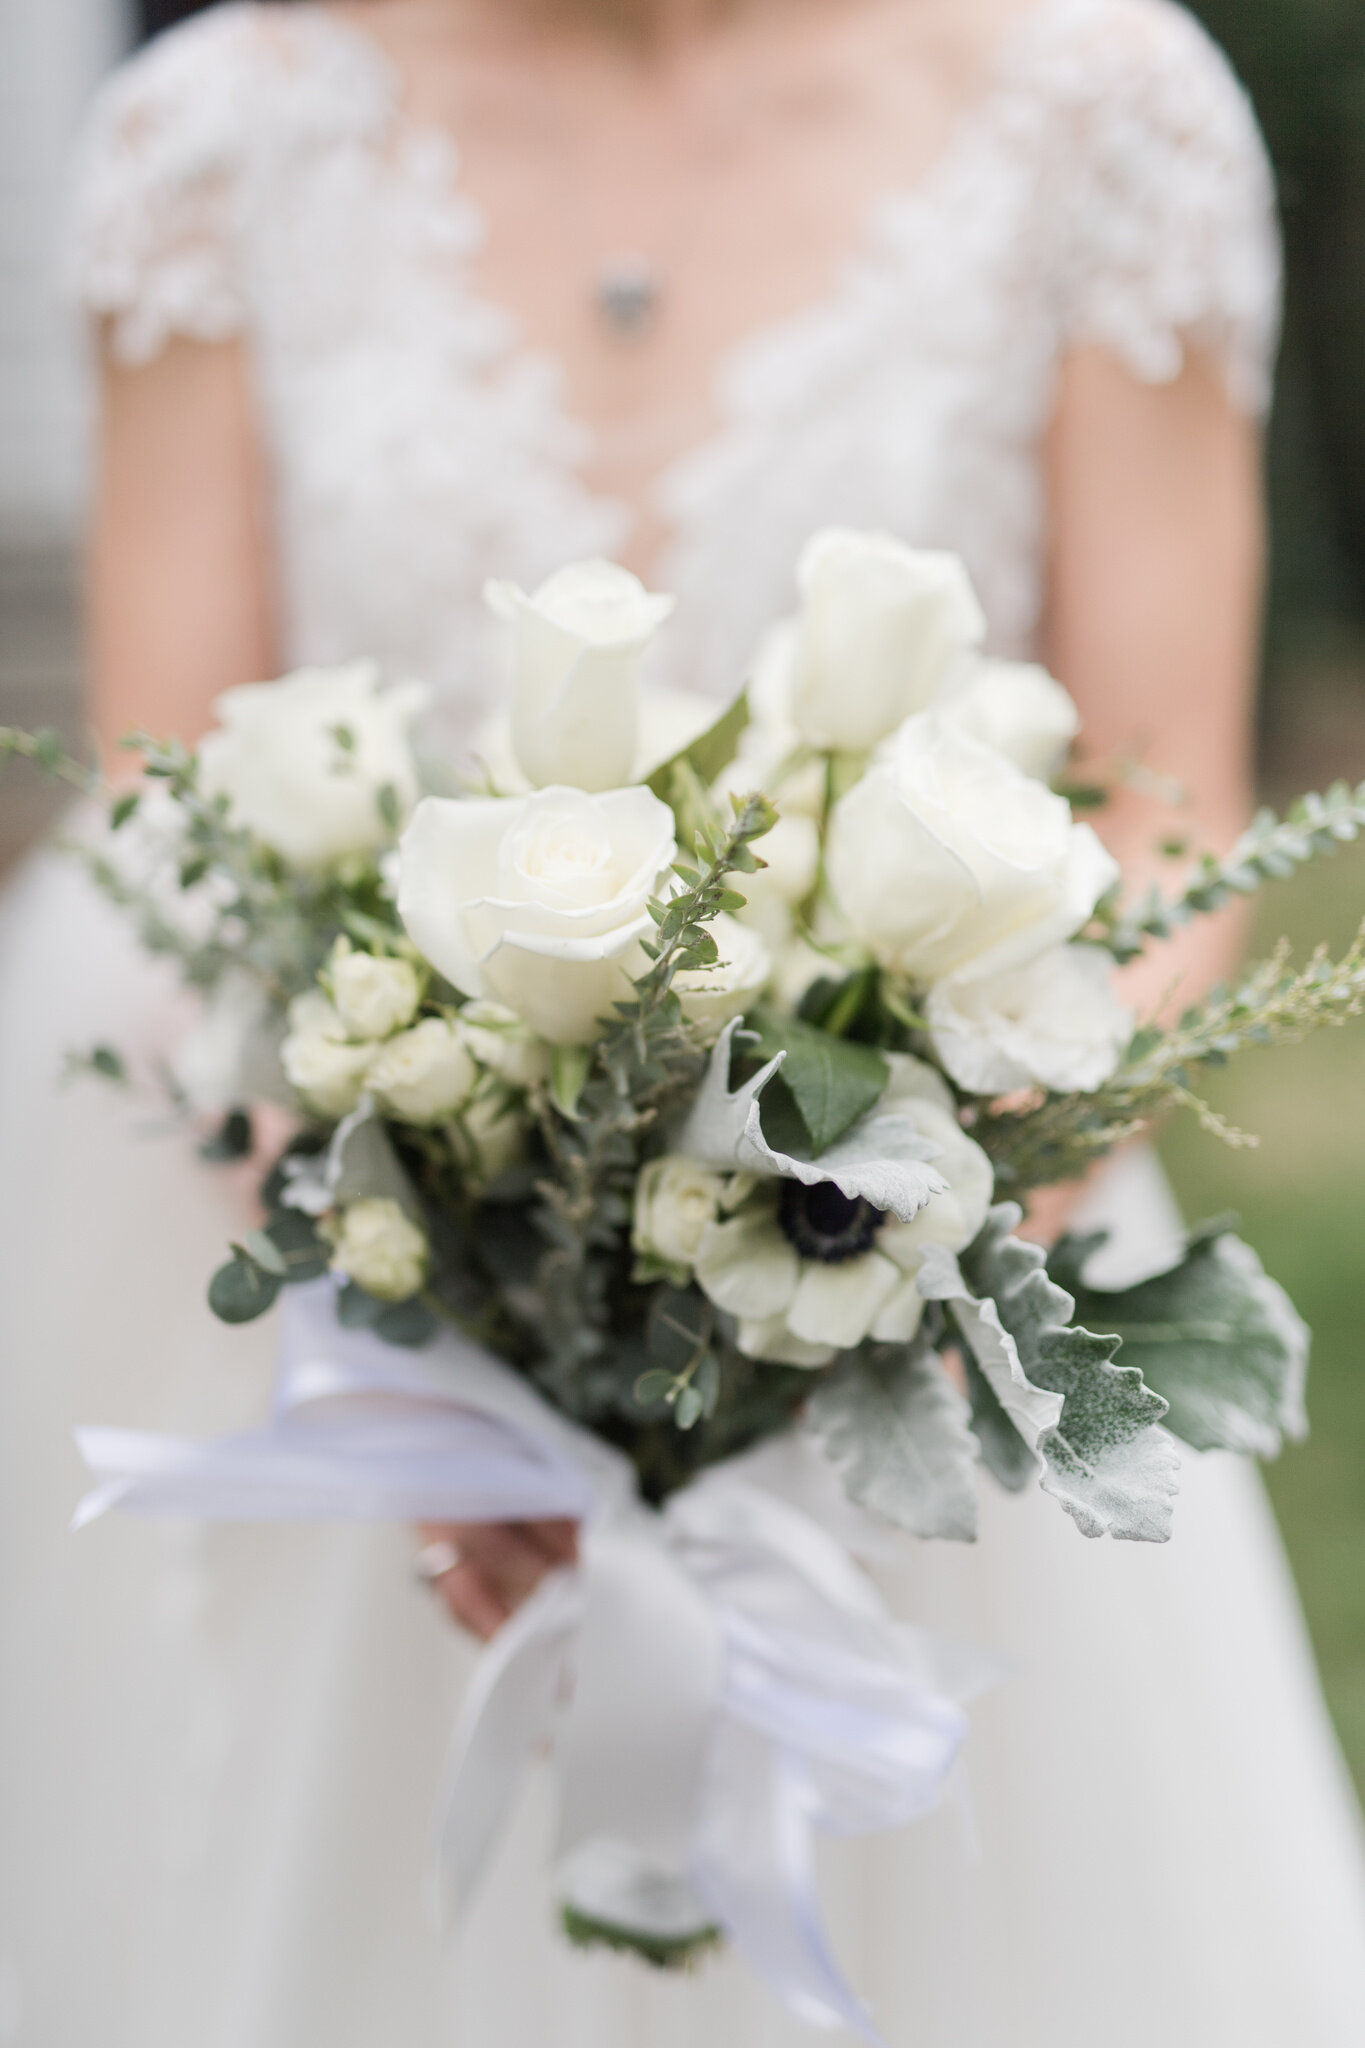 greenwich wedding_belle haven club wedding _ct wedding photographer-18_Easy-Resize.com.jpg